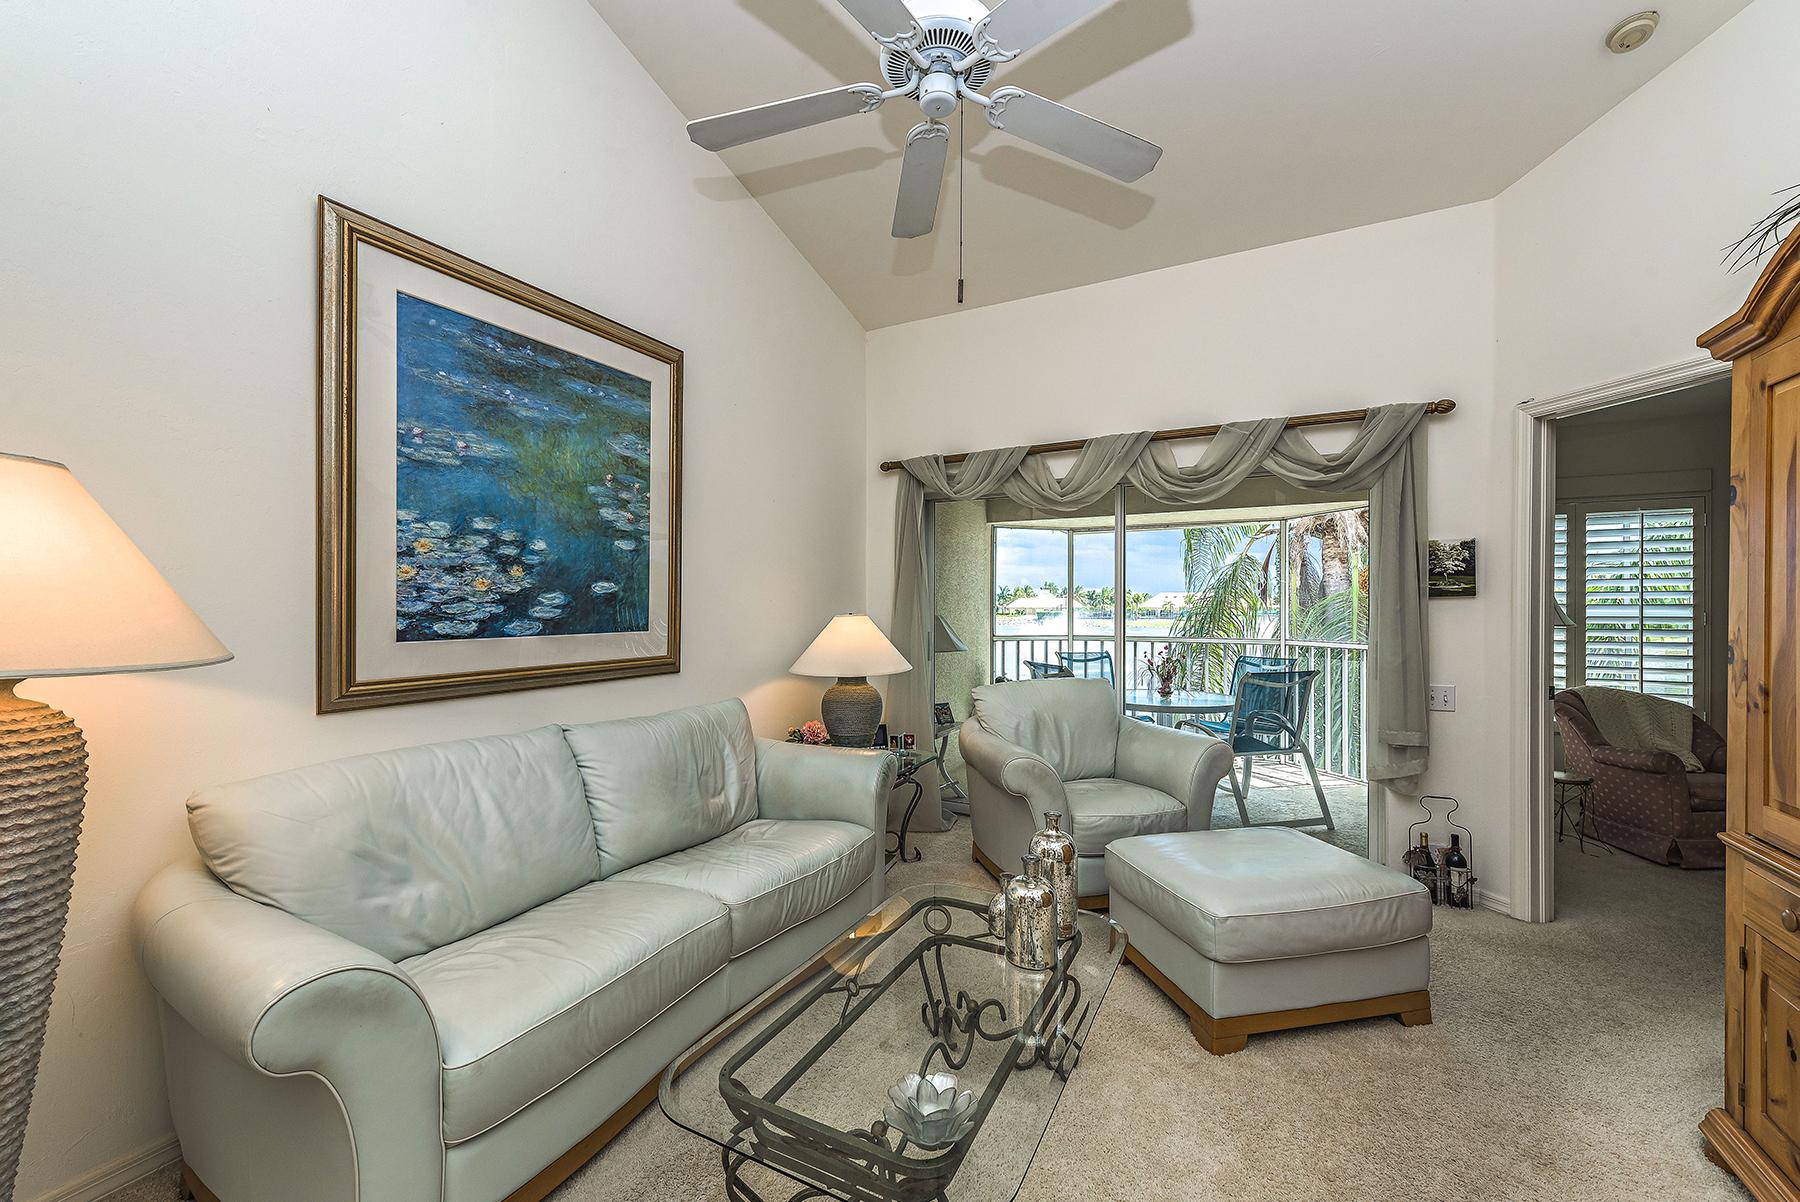 Condominium for Sale at WORTHINGTON 13640 Worthington Way 1908 Bonita Springs, Florida, 34135 United States